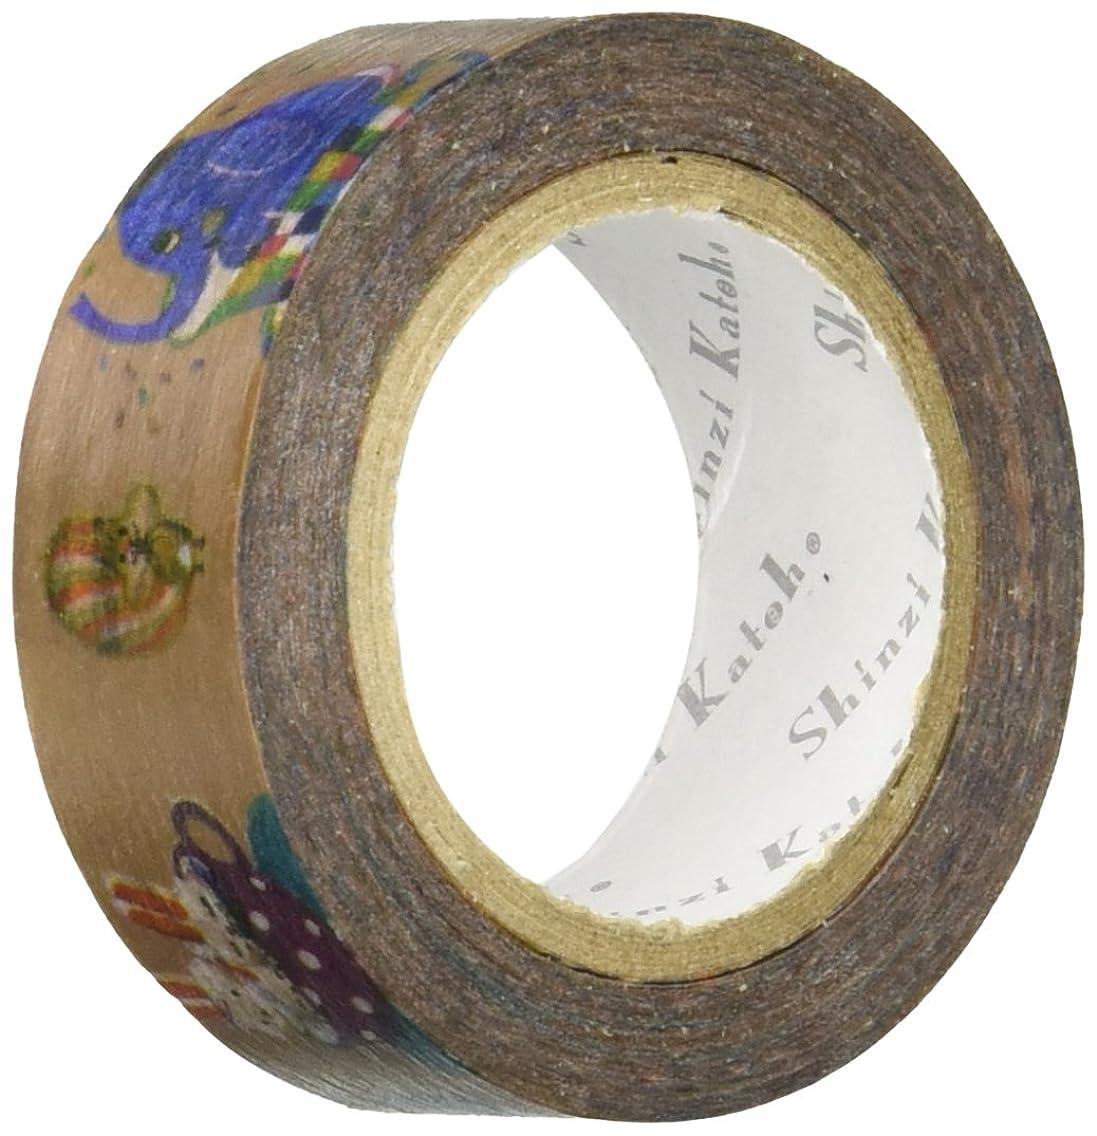 SEAL-DO Washi Masking Tape, Masking Plus Paris Lanthanum, Funny Animals, 15mm x 10m (ks-mt-10116)